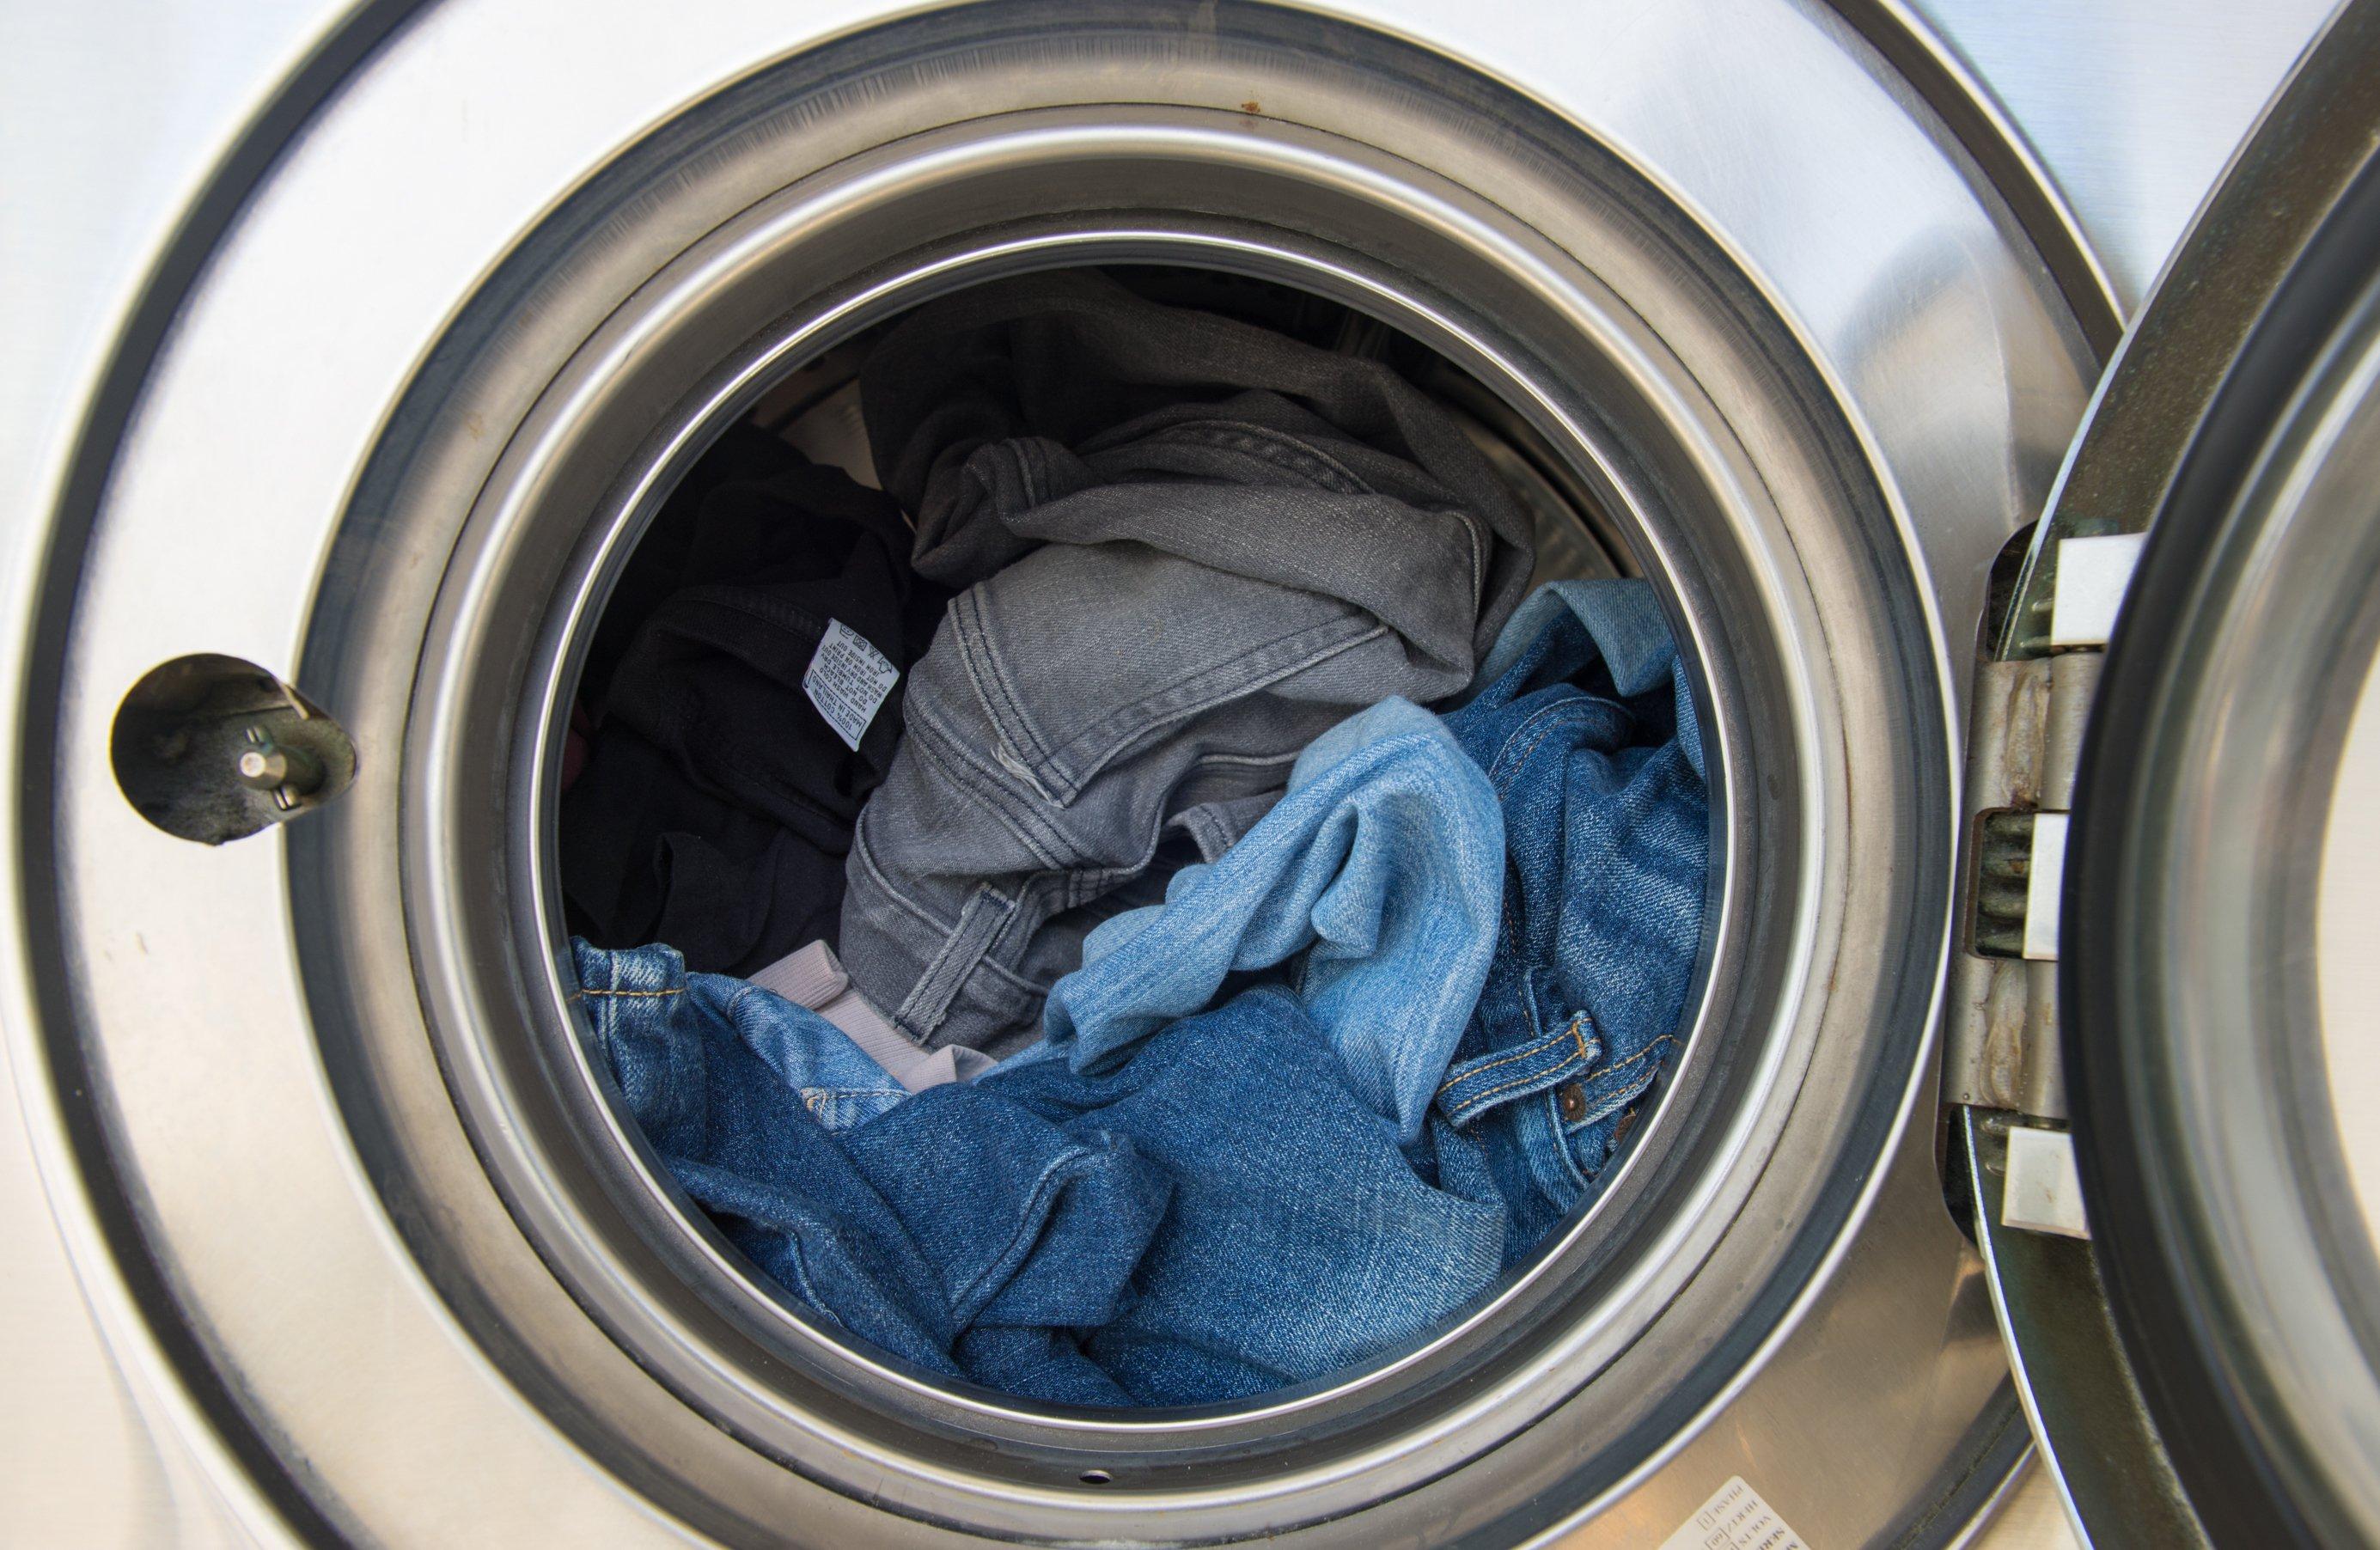 Canva - Laundry machine